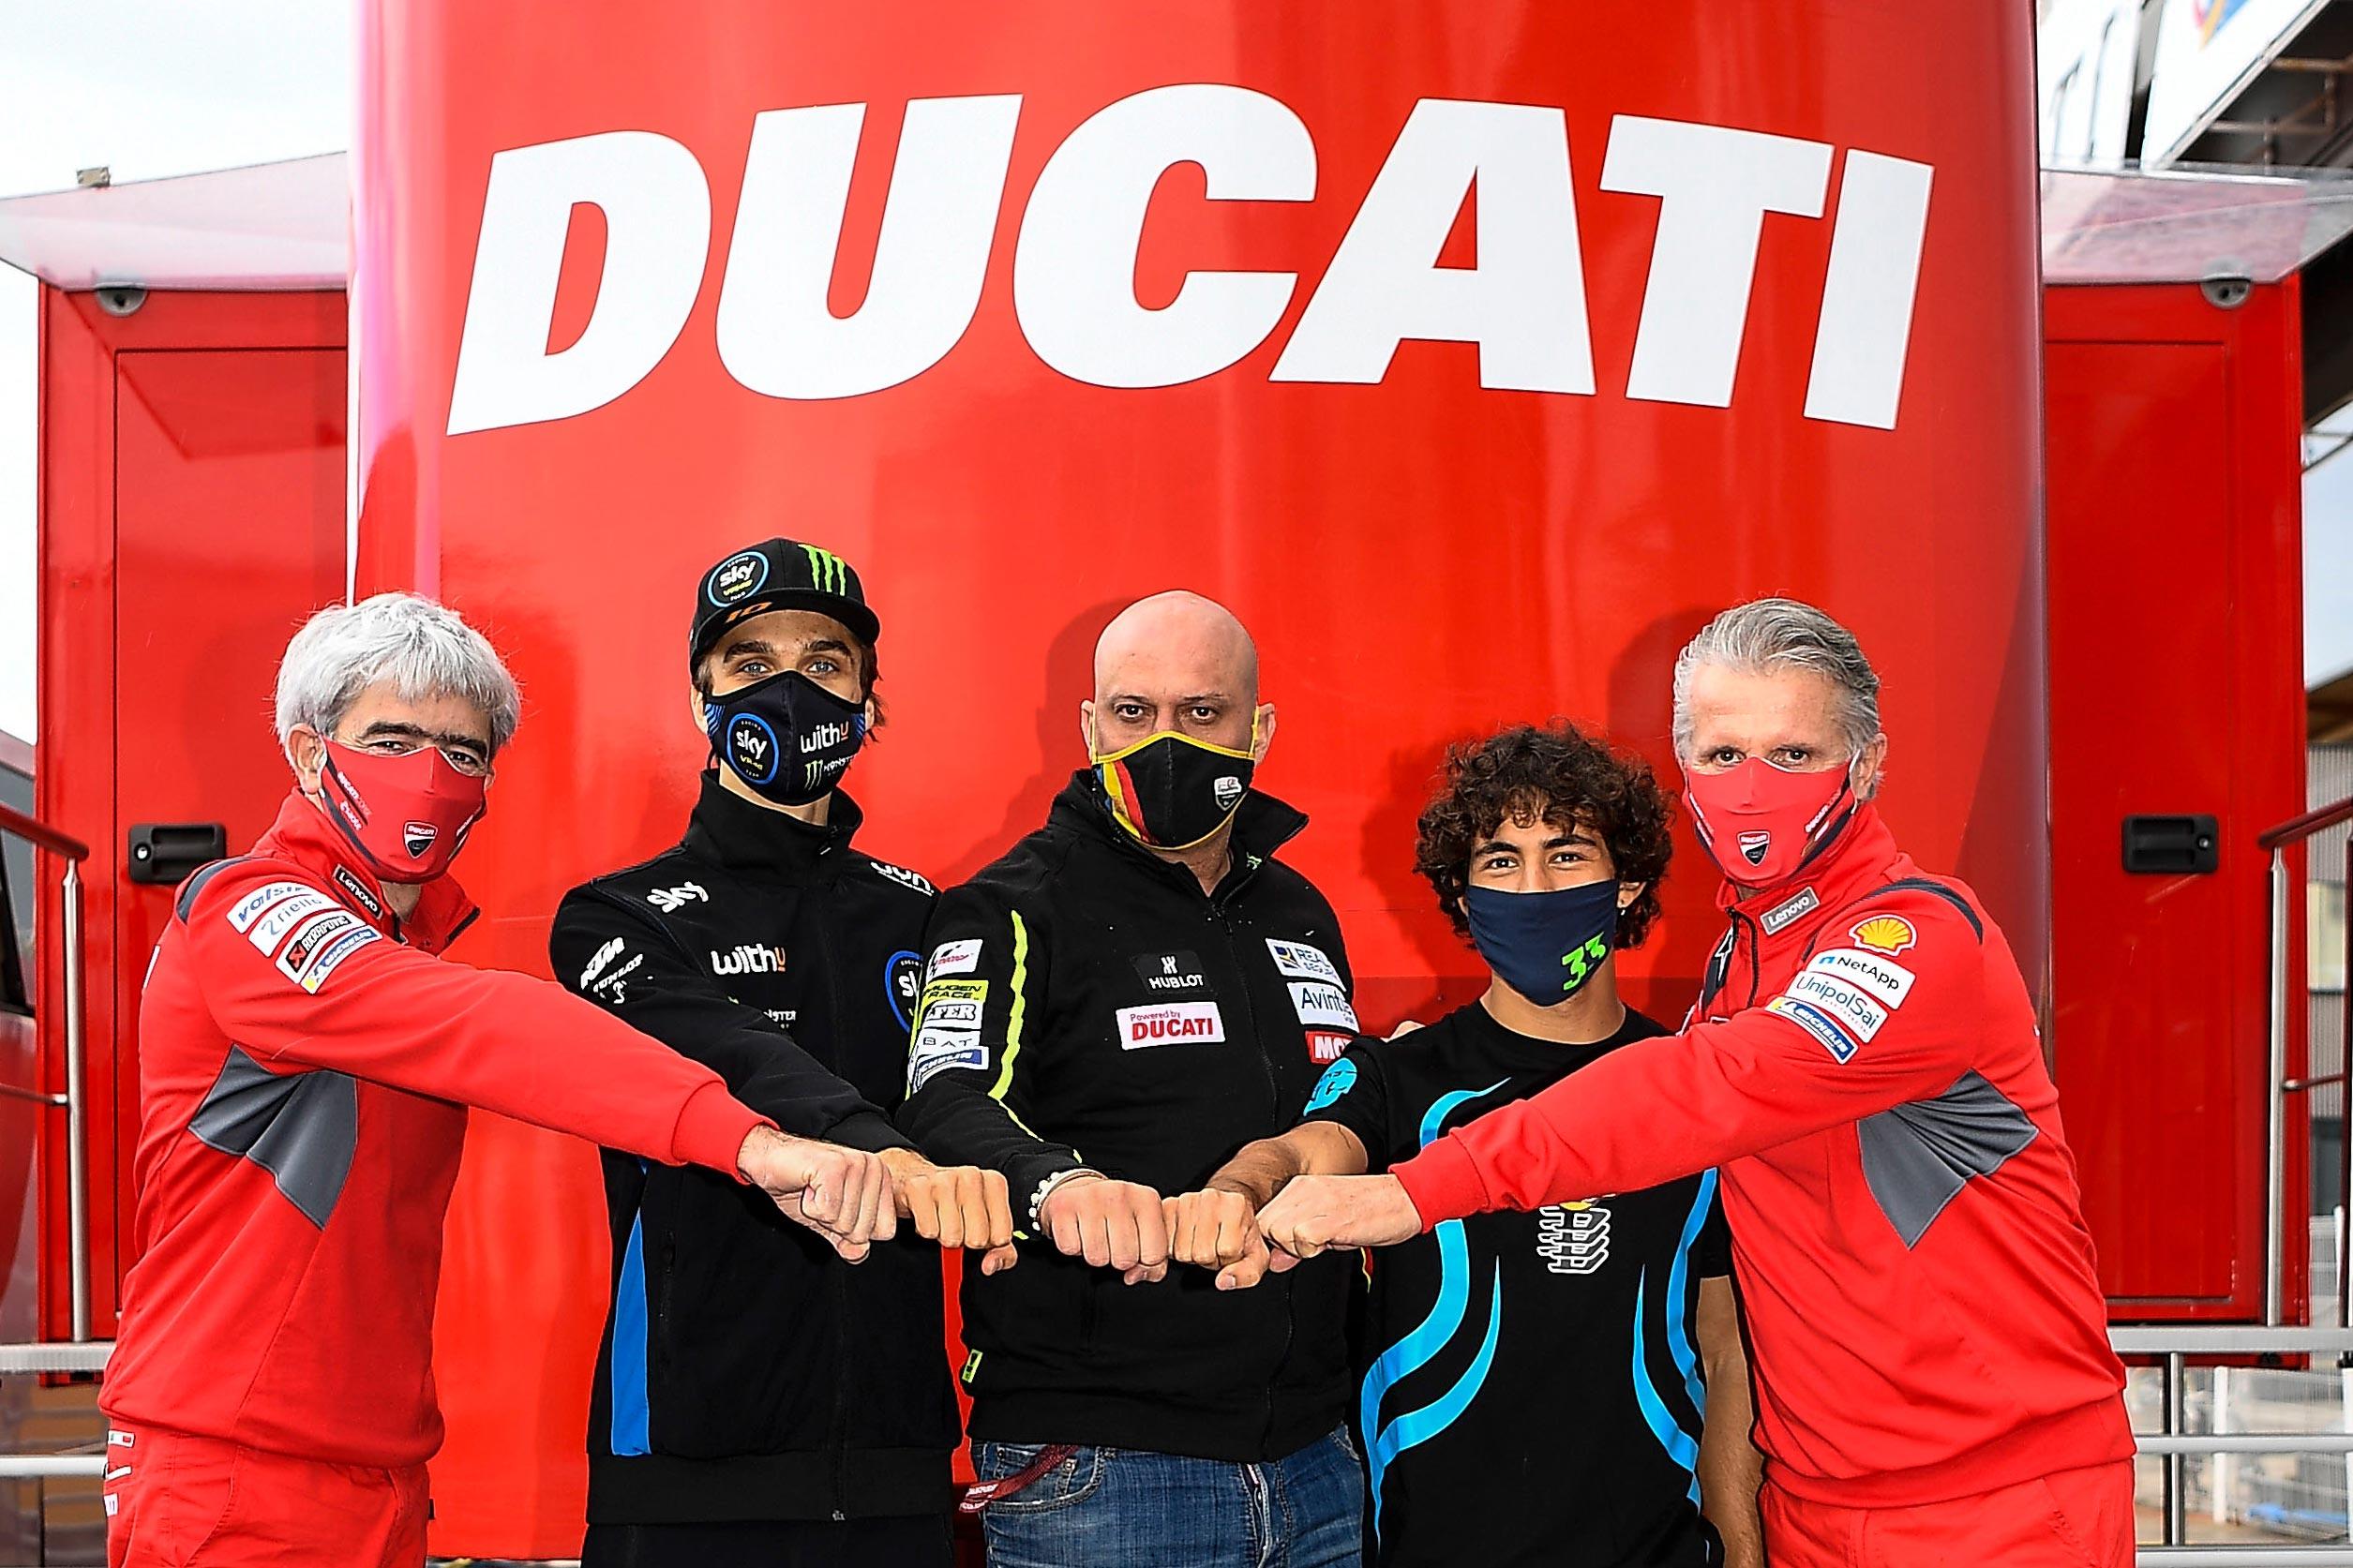 Luca Marini & Enea Bastianini Confirmed at Avintia Ducati for 2021 -  Asphalt & Rubber